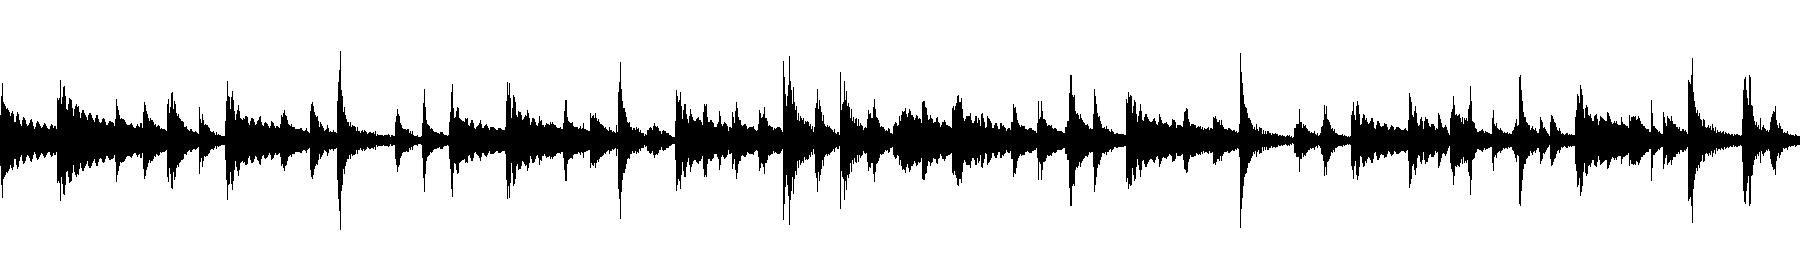 arab percussion loop 47